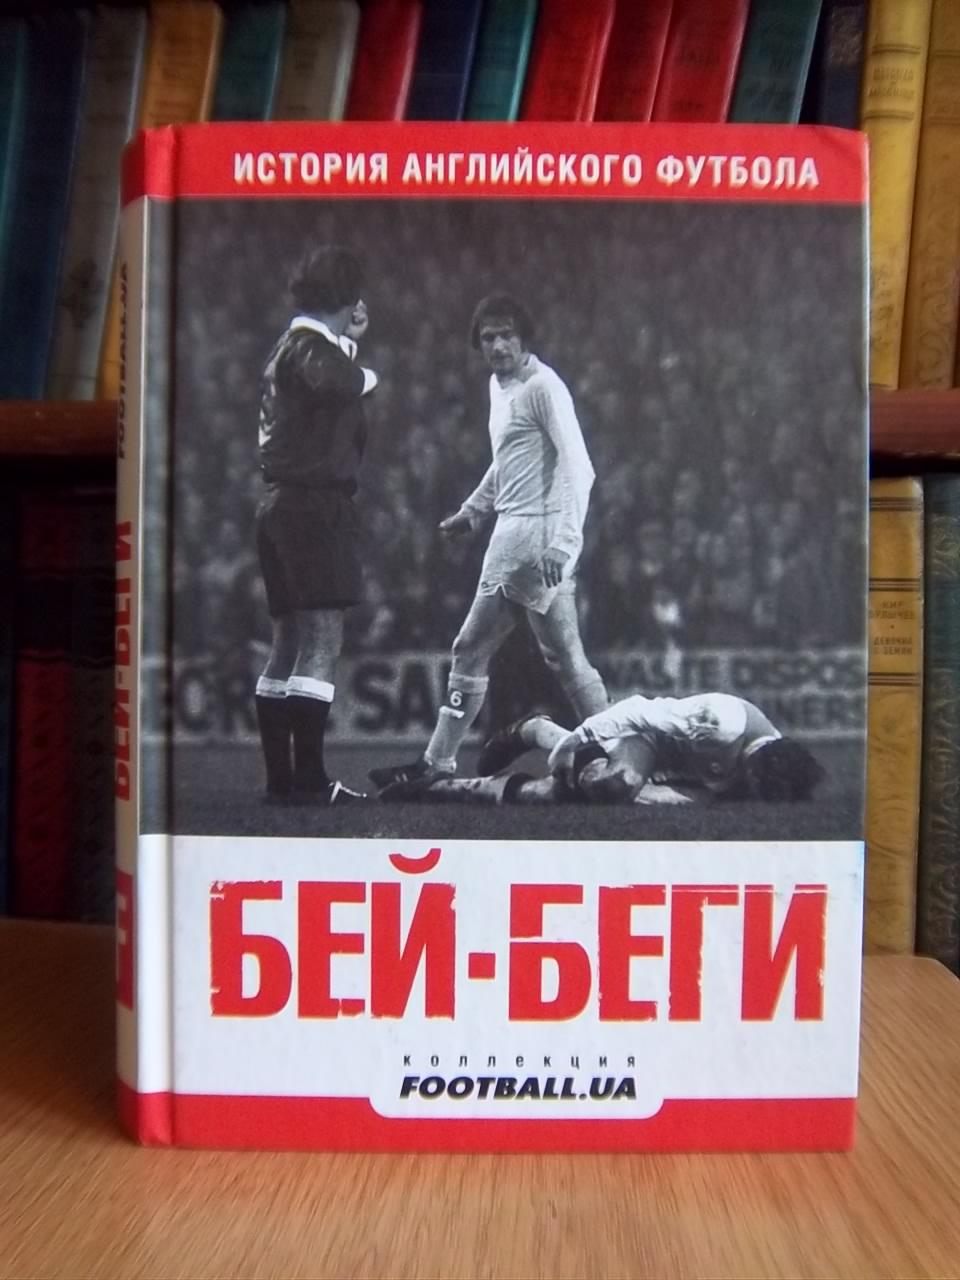 Бей-беги История английского футбола